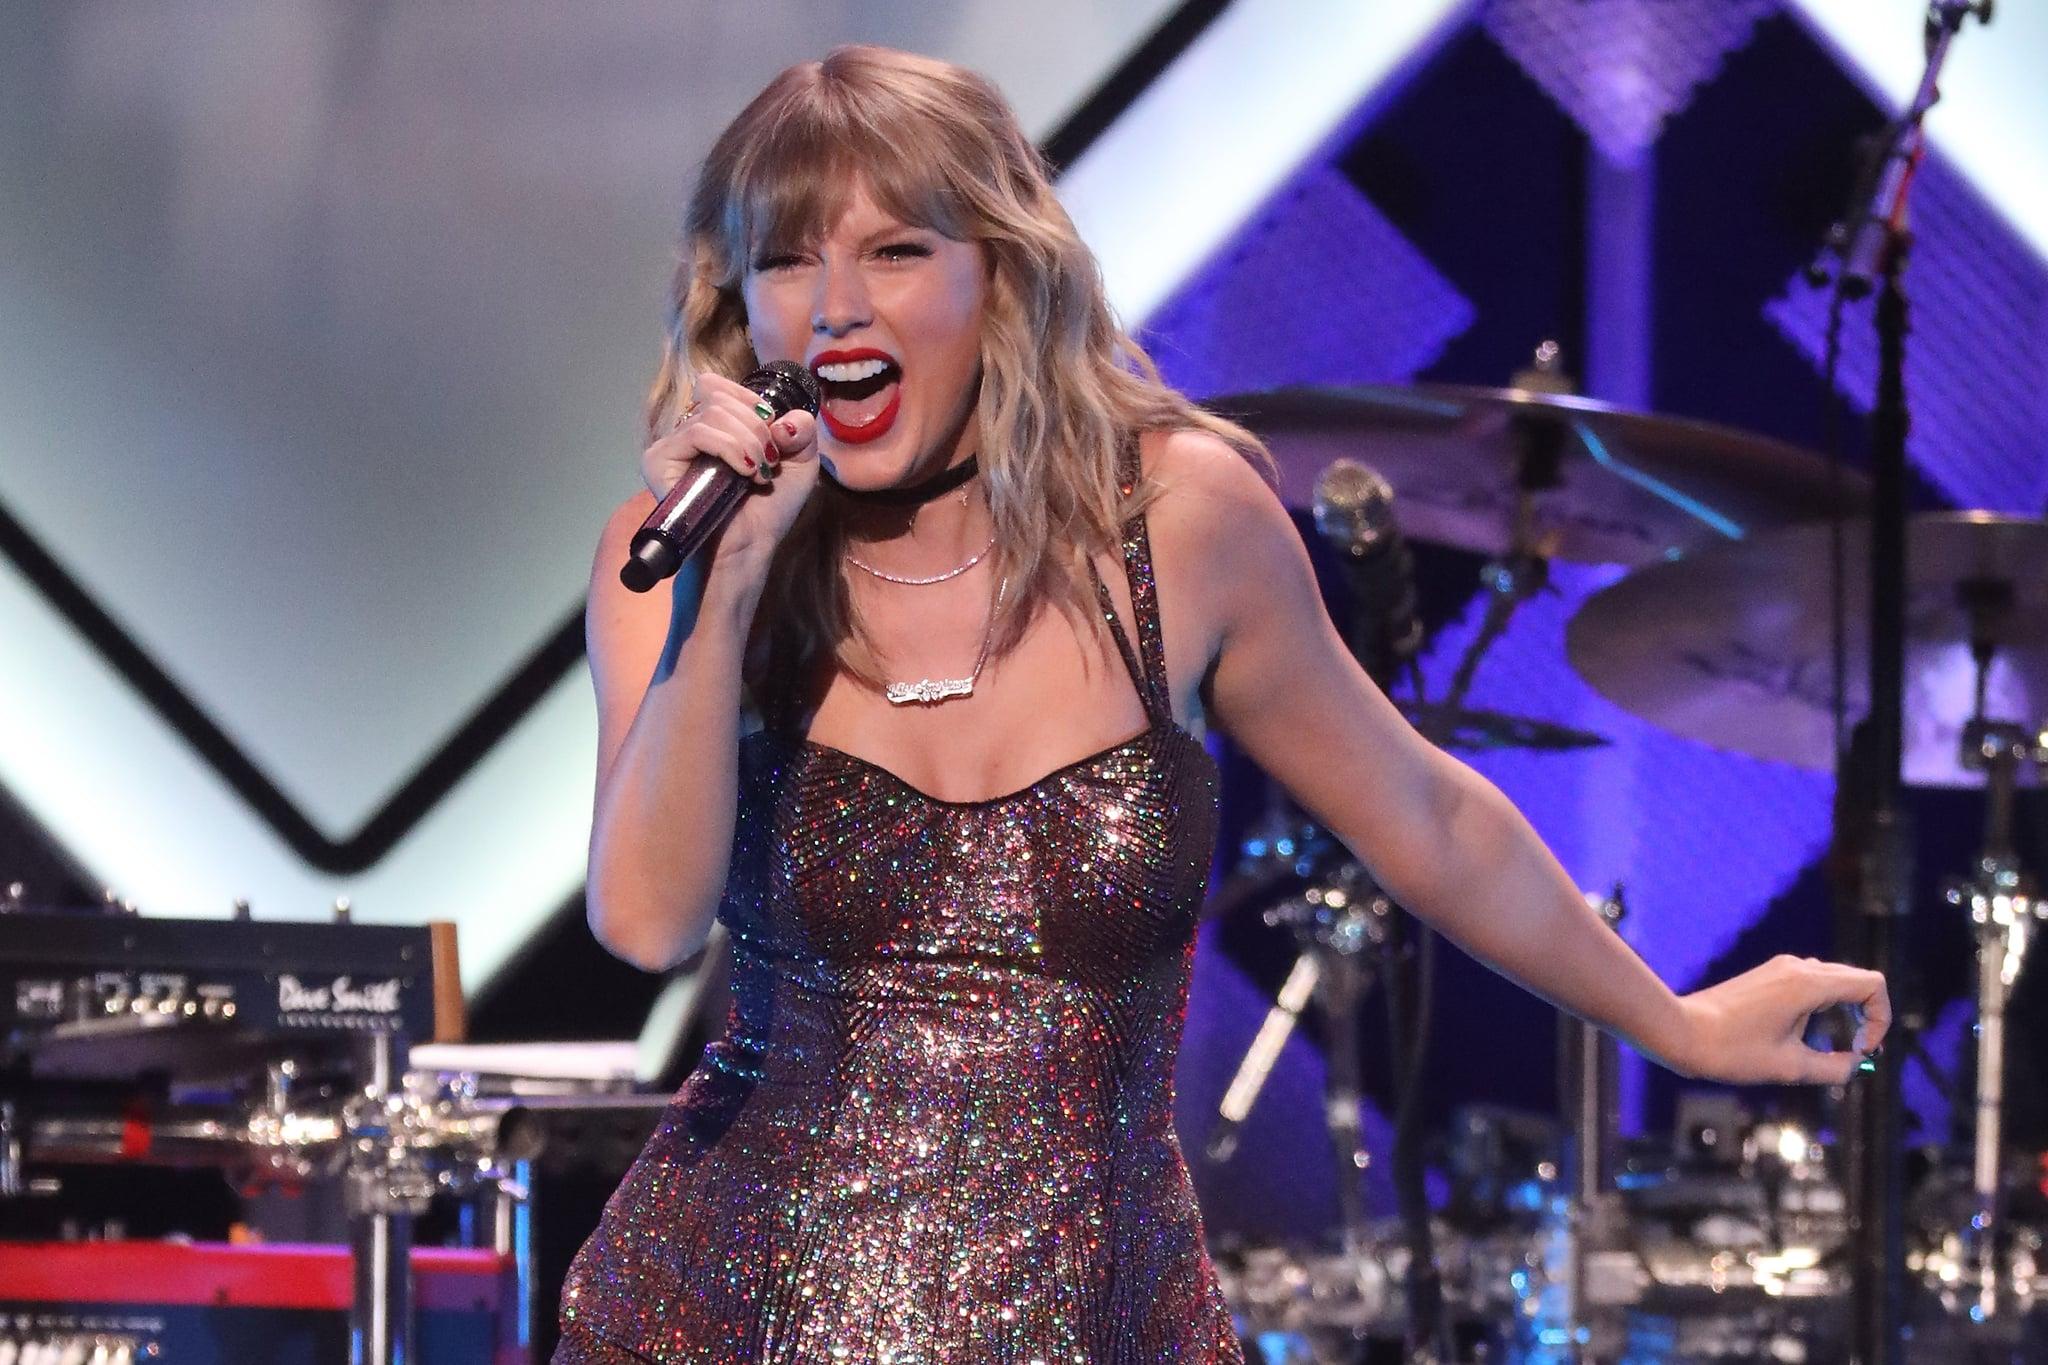 Taylor Swift Is Headlining Glastonbury Music Festival 2020 | POPSUGAR Entertainment UK